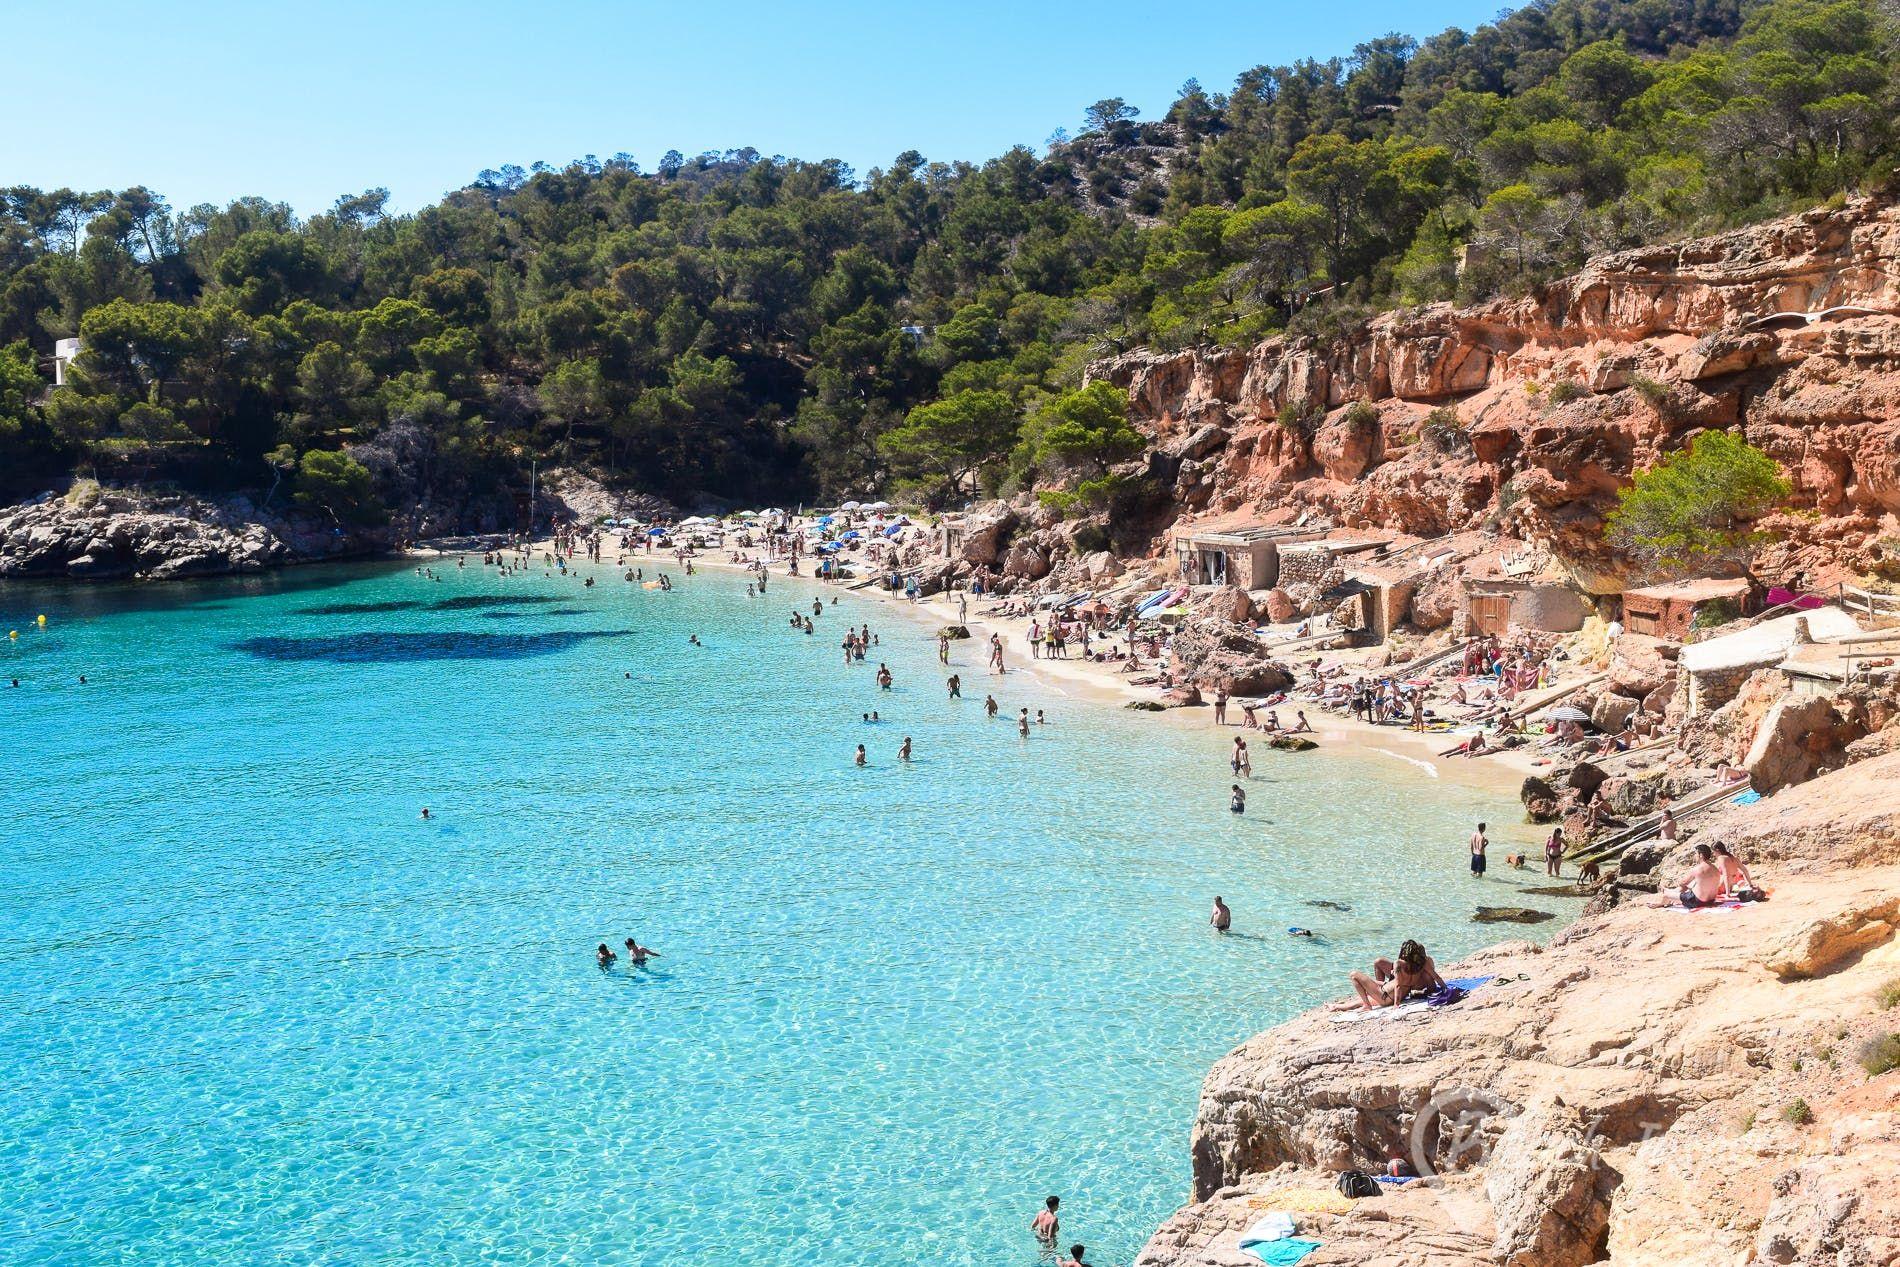 Strand Cala Salada Ibiza Spanien Ibiza Urlaub Reiseziele Ibiza